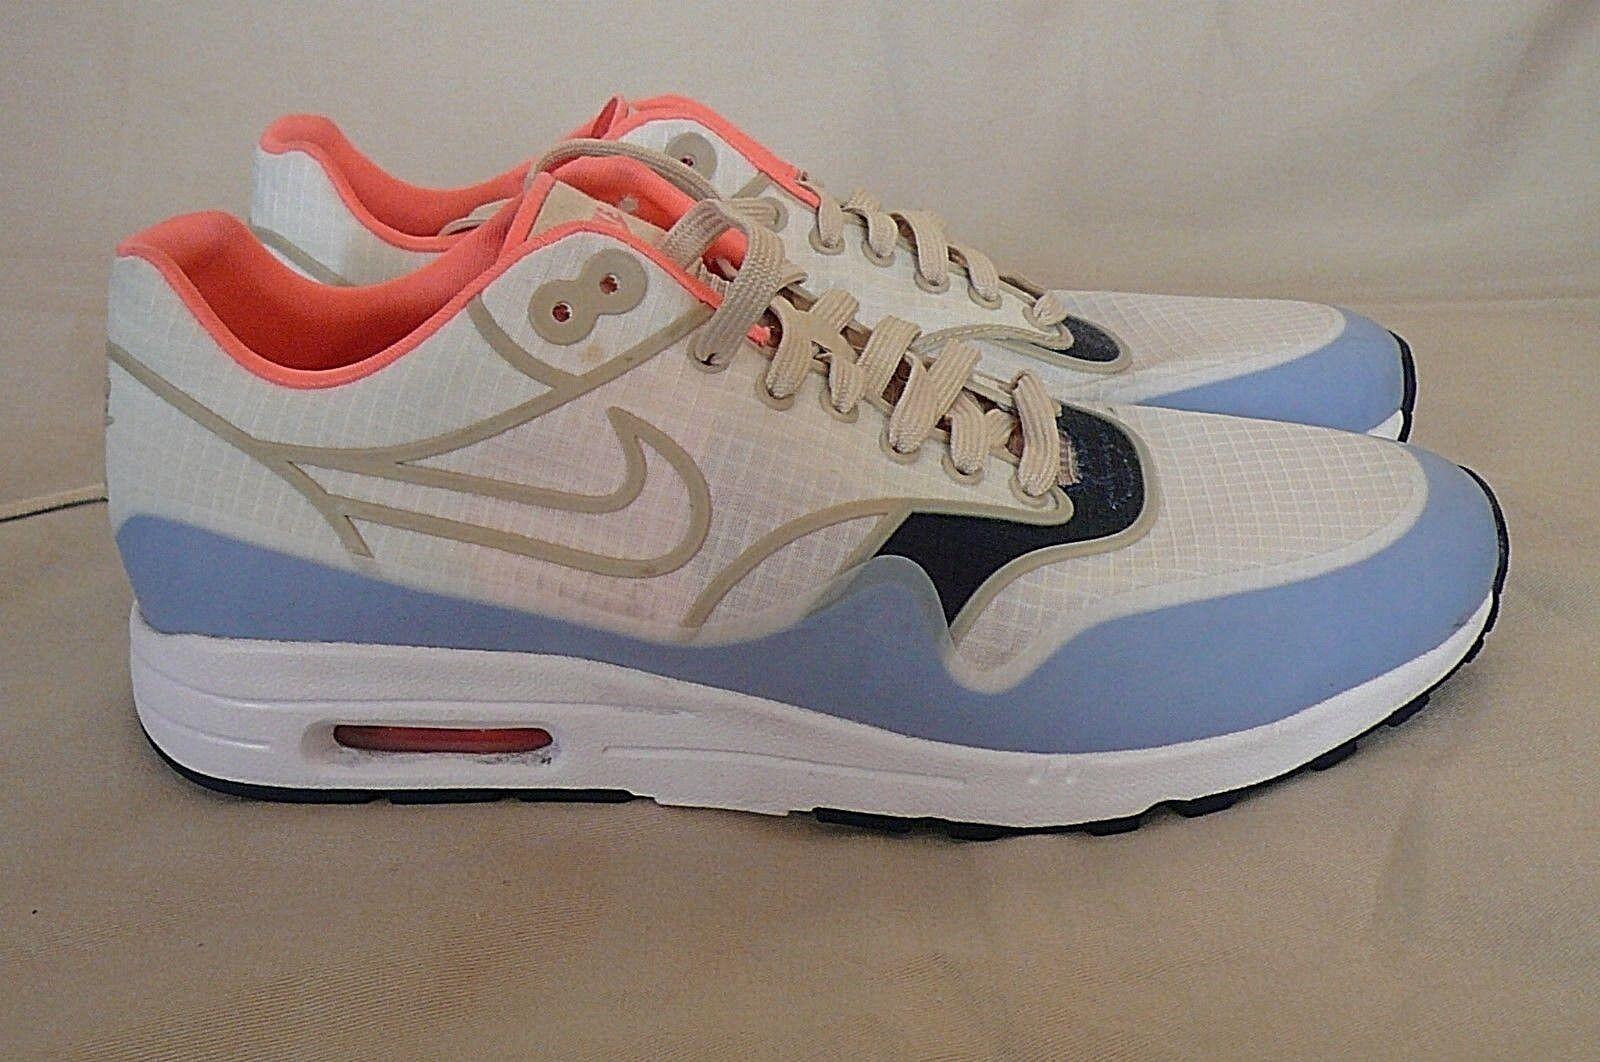 Donna: Scarpe da ginnastica Nike Air Max 1 Ultra 2.0 si 102 [881103]